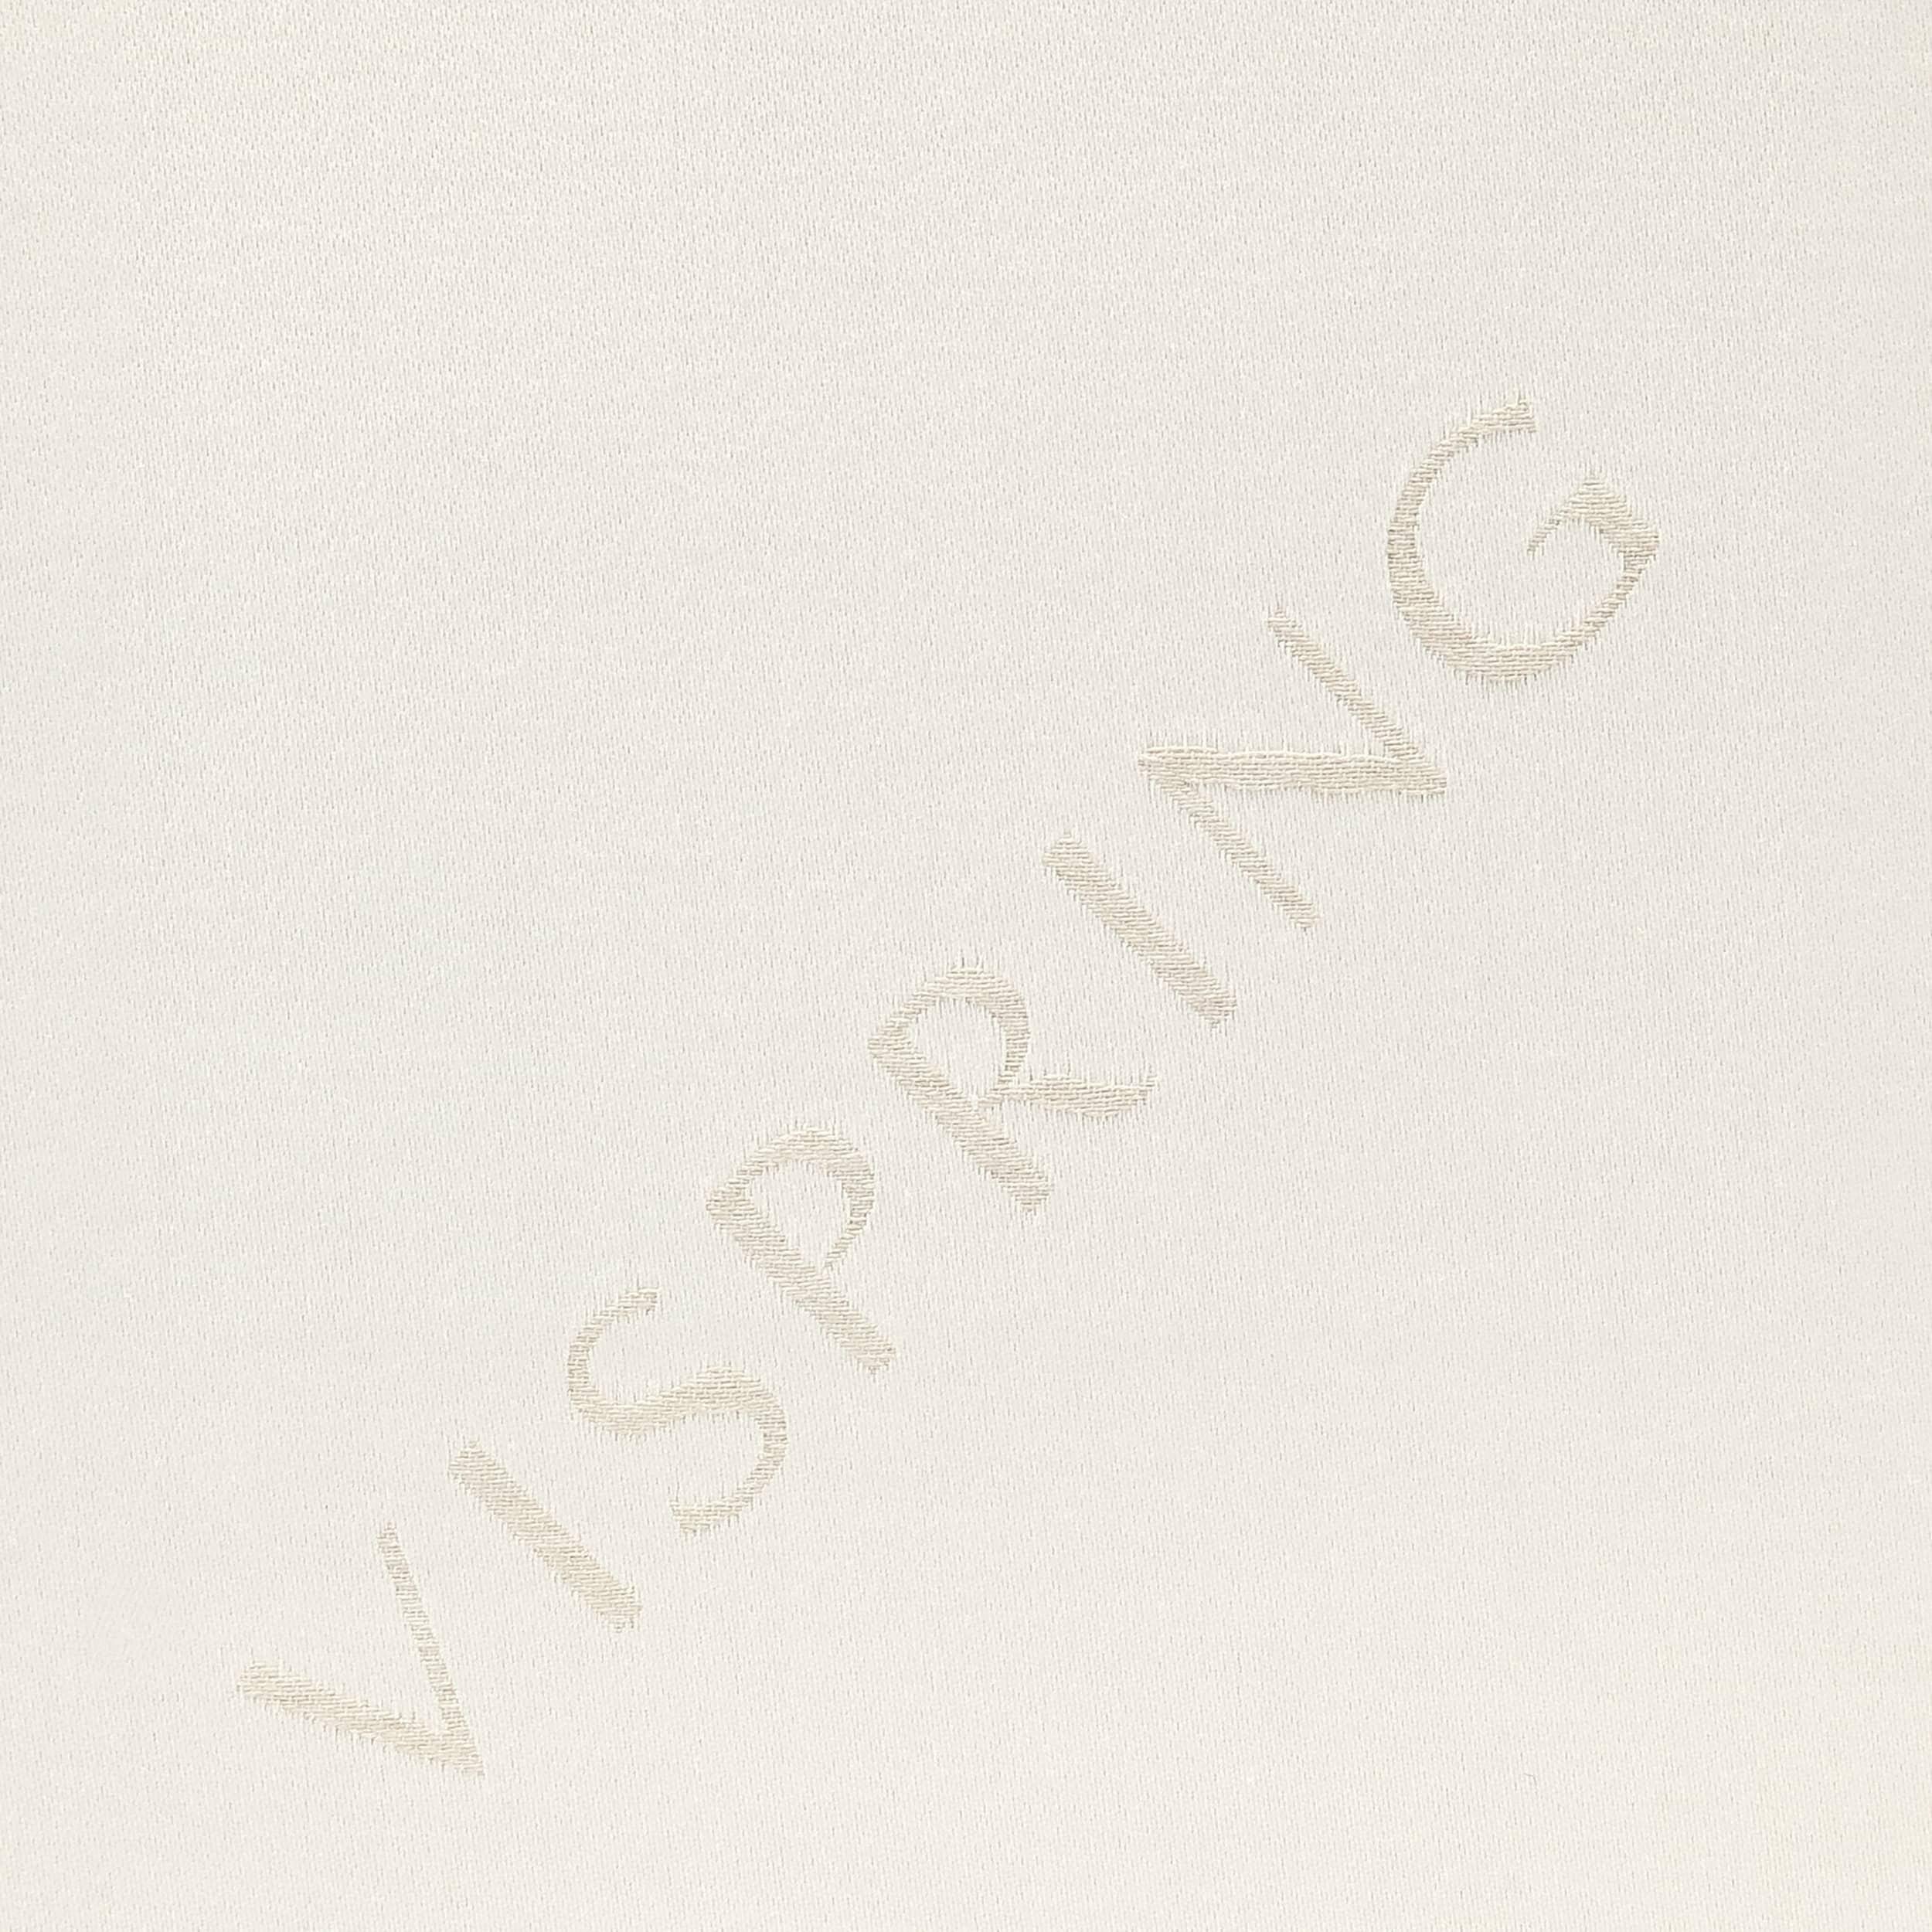 VISPRING LOGO - Oyster